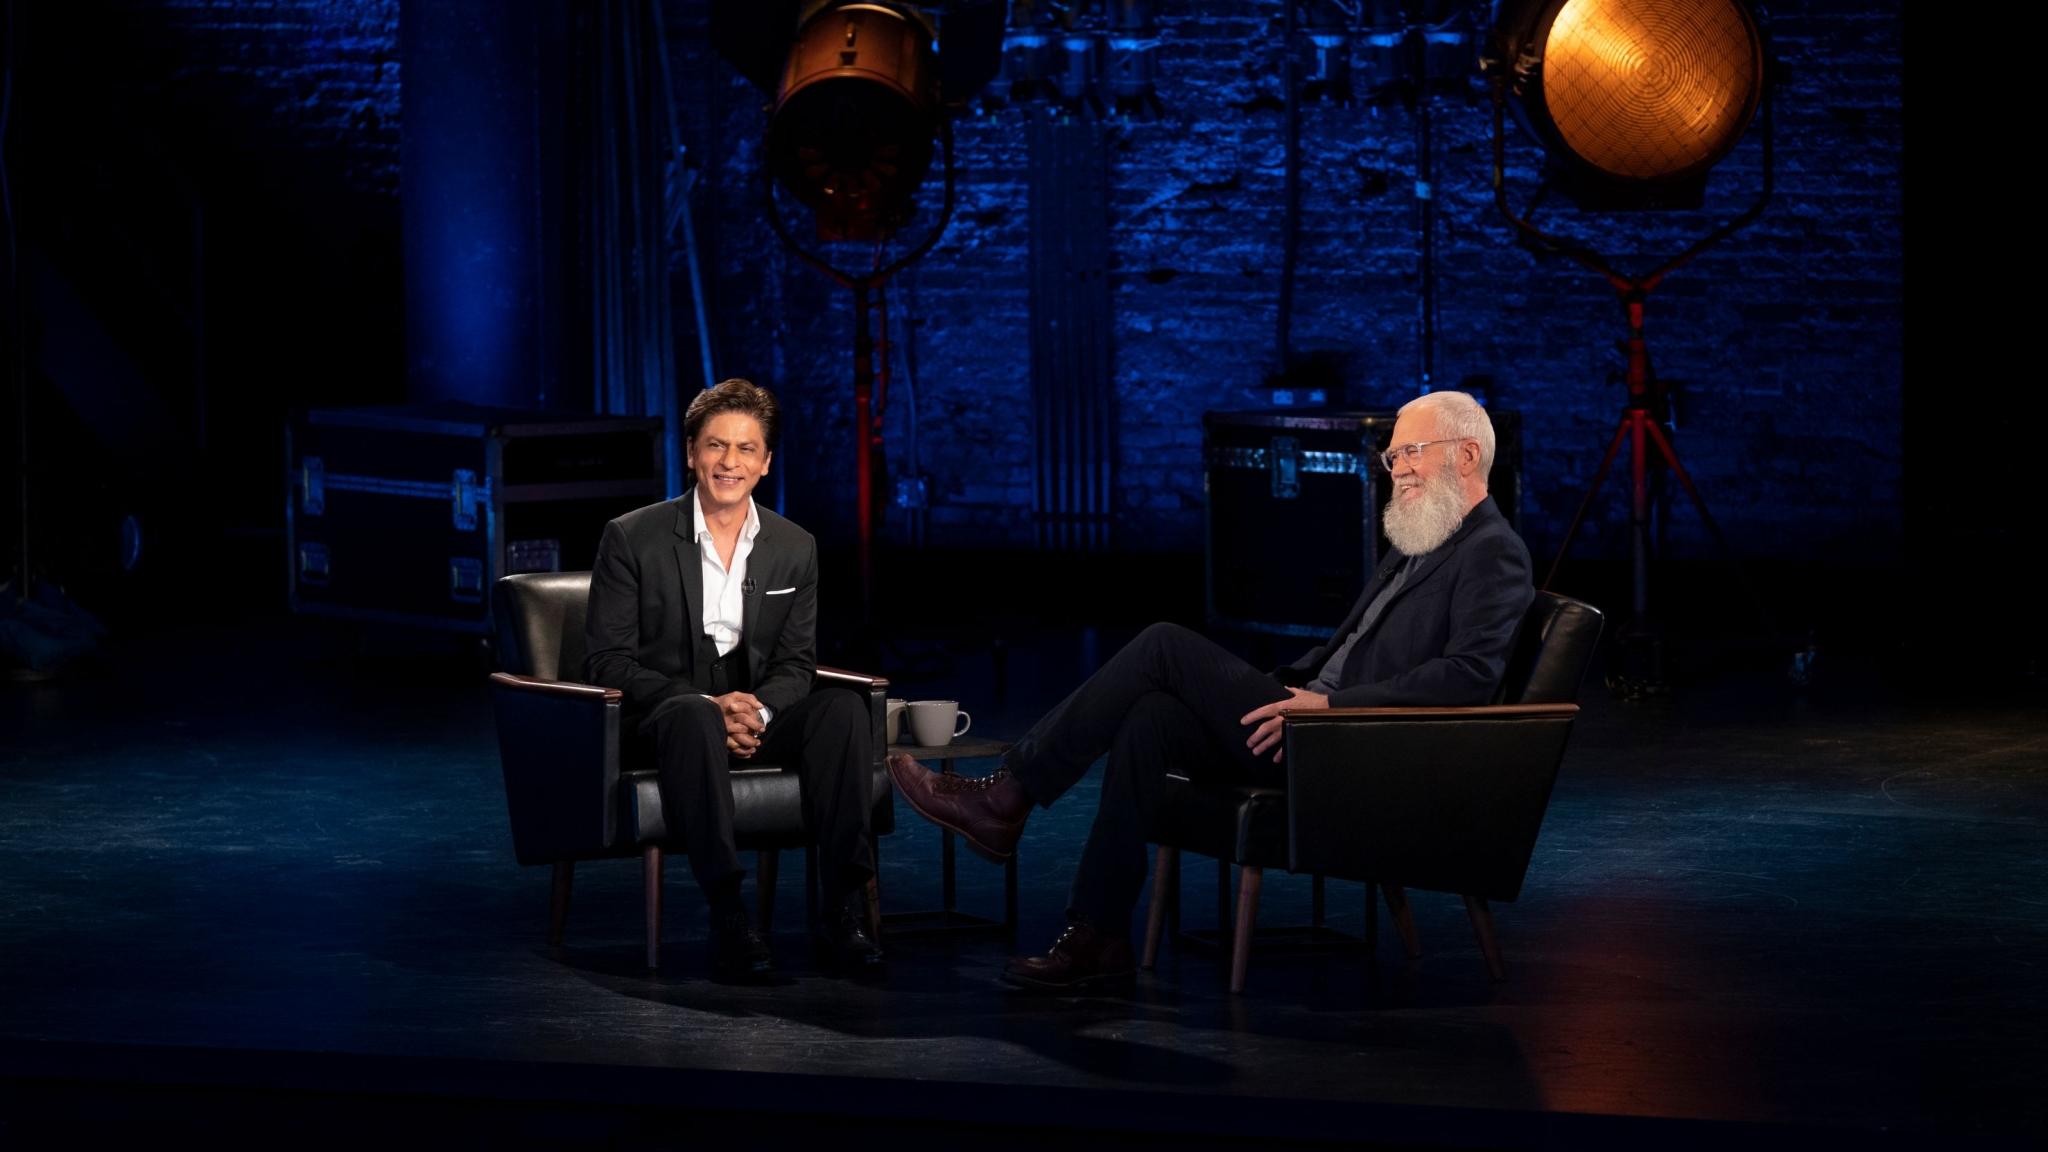 SRK, Gauri, David Letterman Sit Down for a Meal in Netflix Trailer